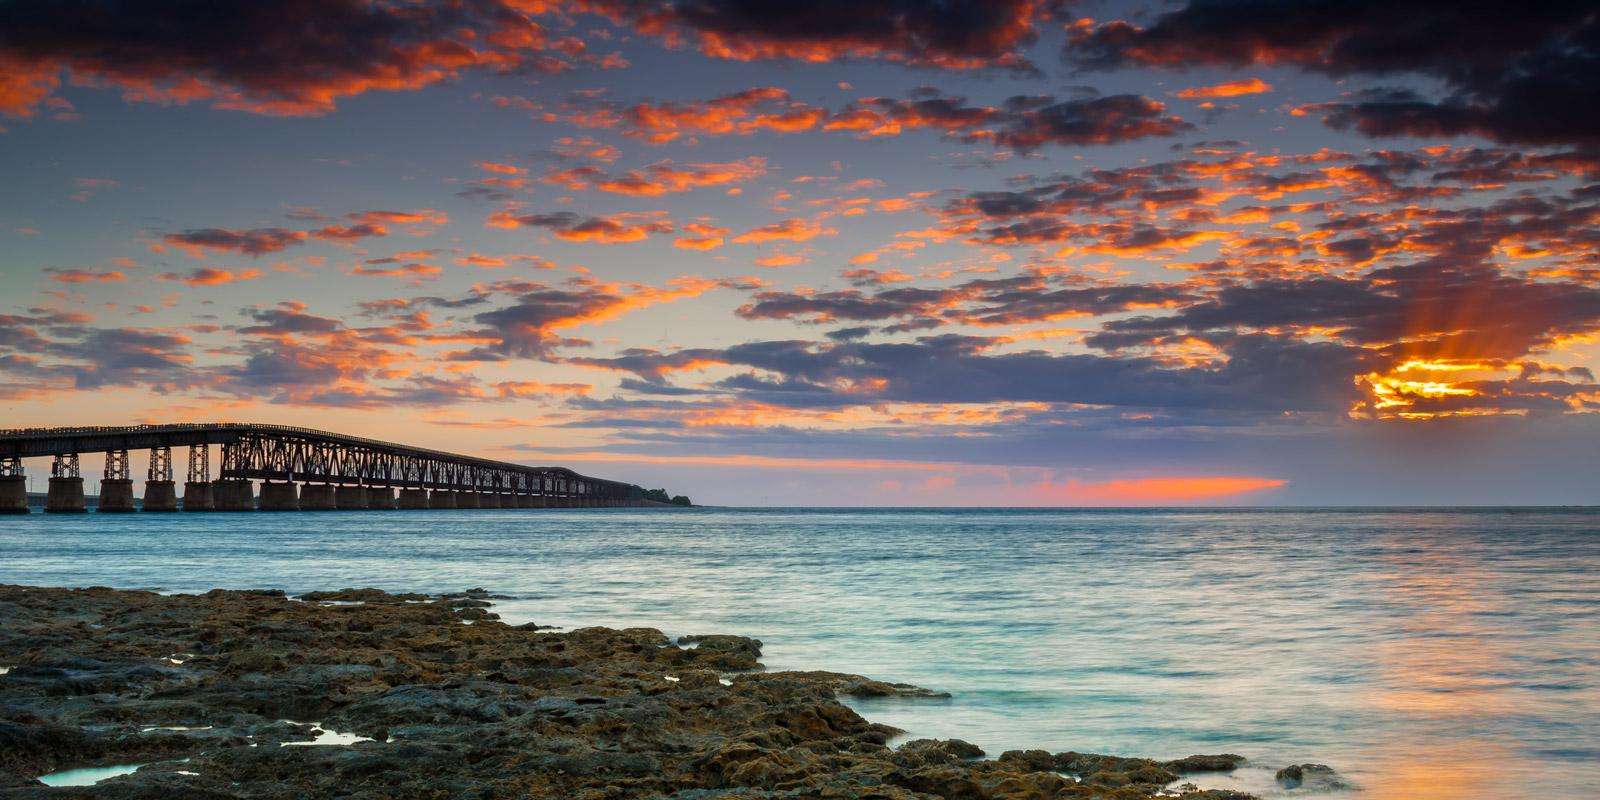 Florida, Florida Keys, Bahia Honda, sunrise, limited edition, photograph, fine art, landscape, coast, photo